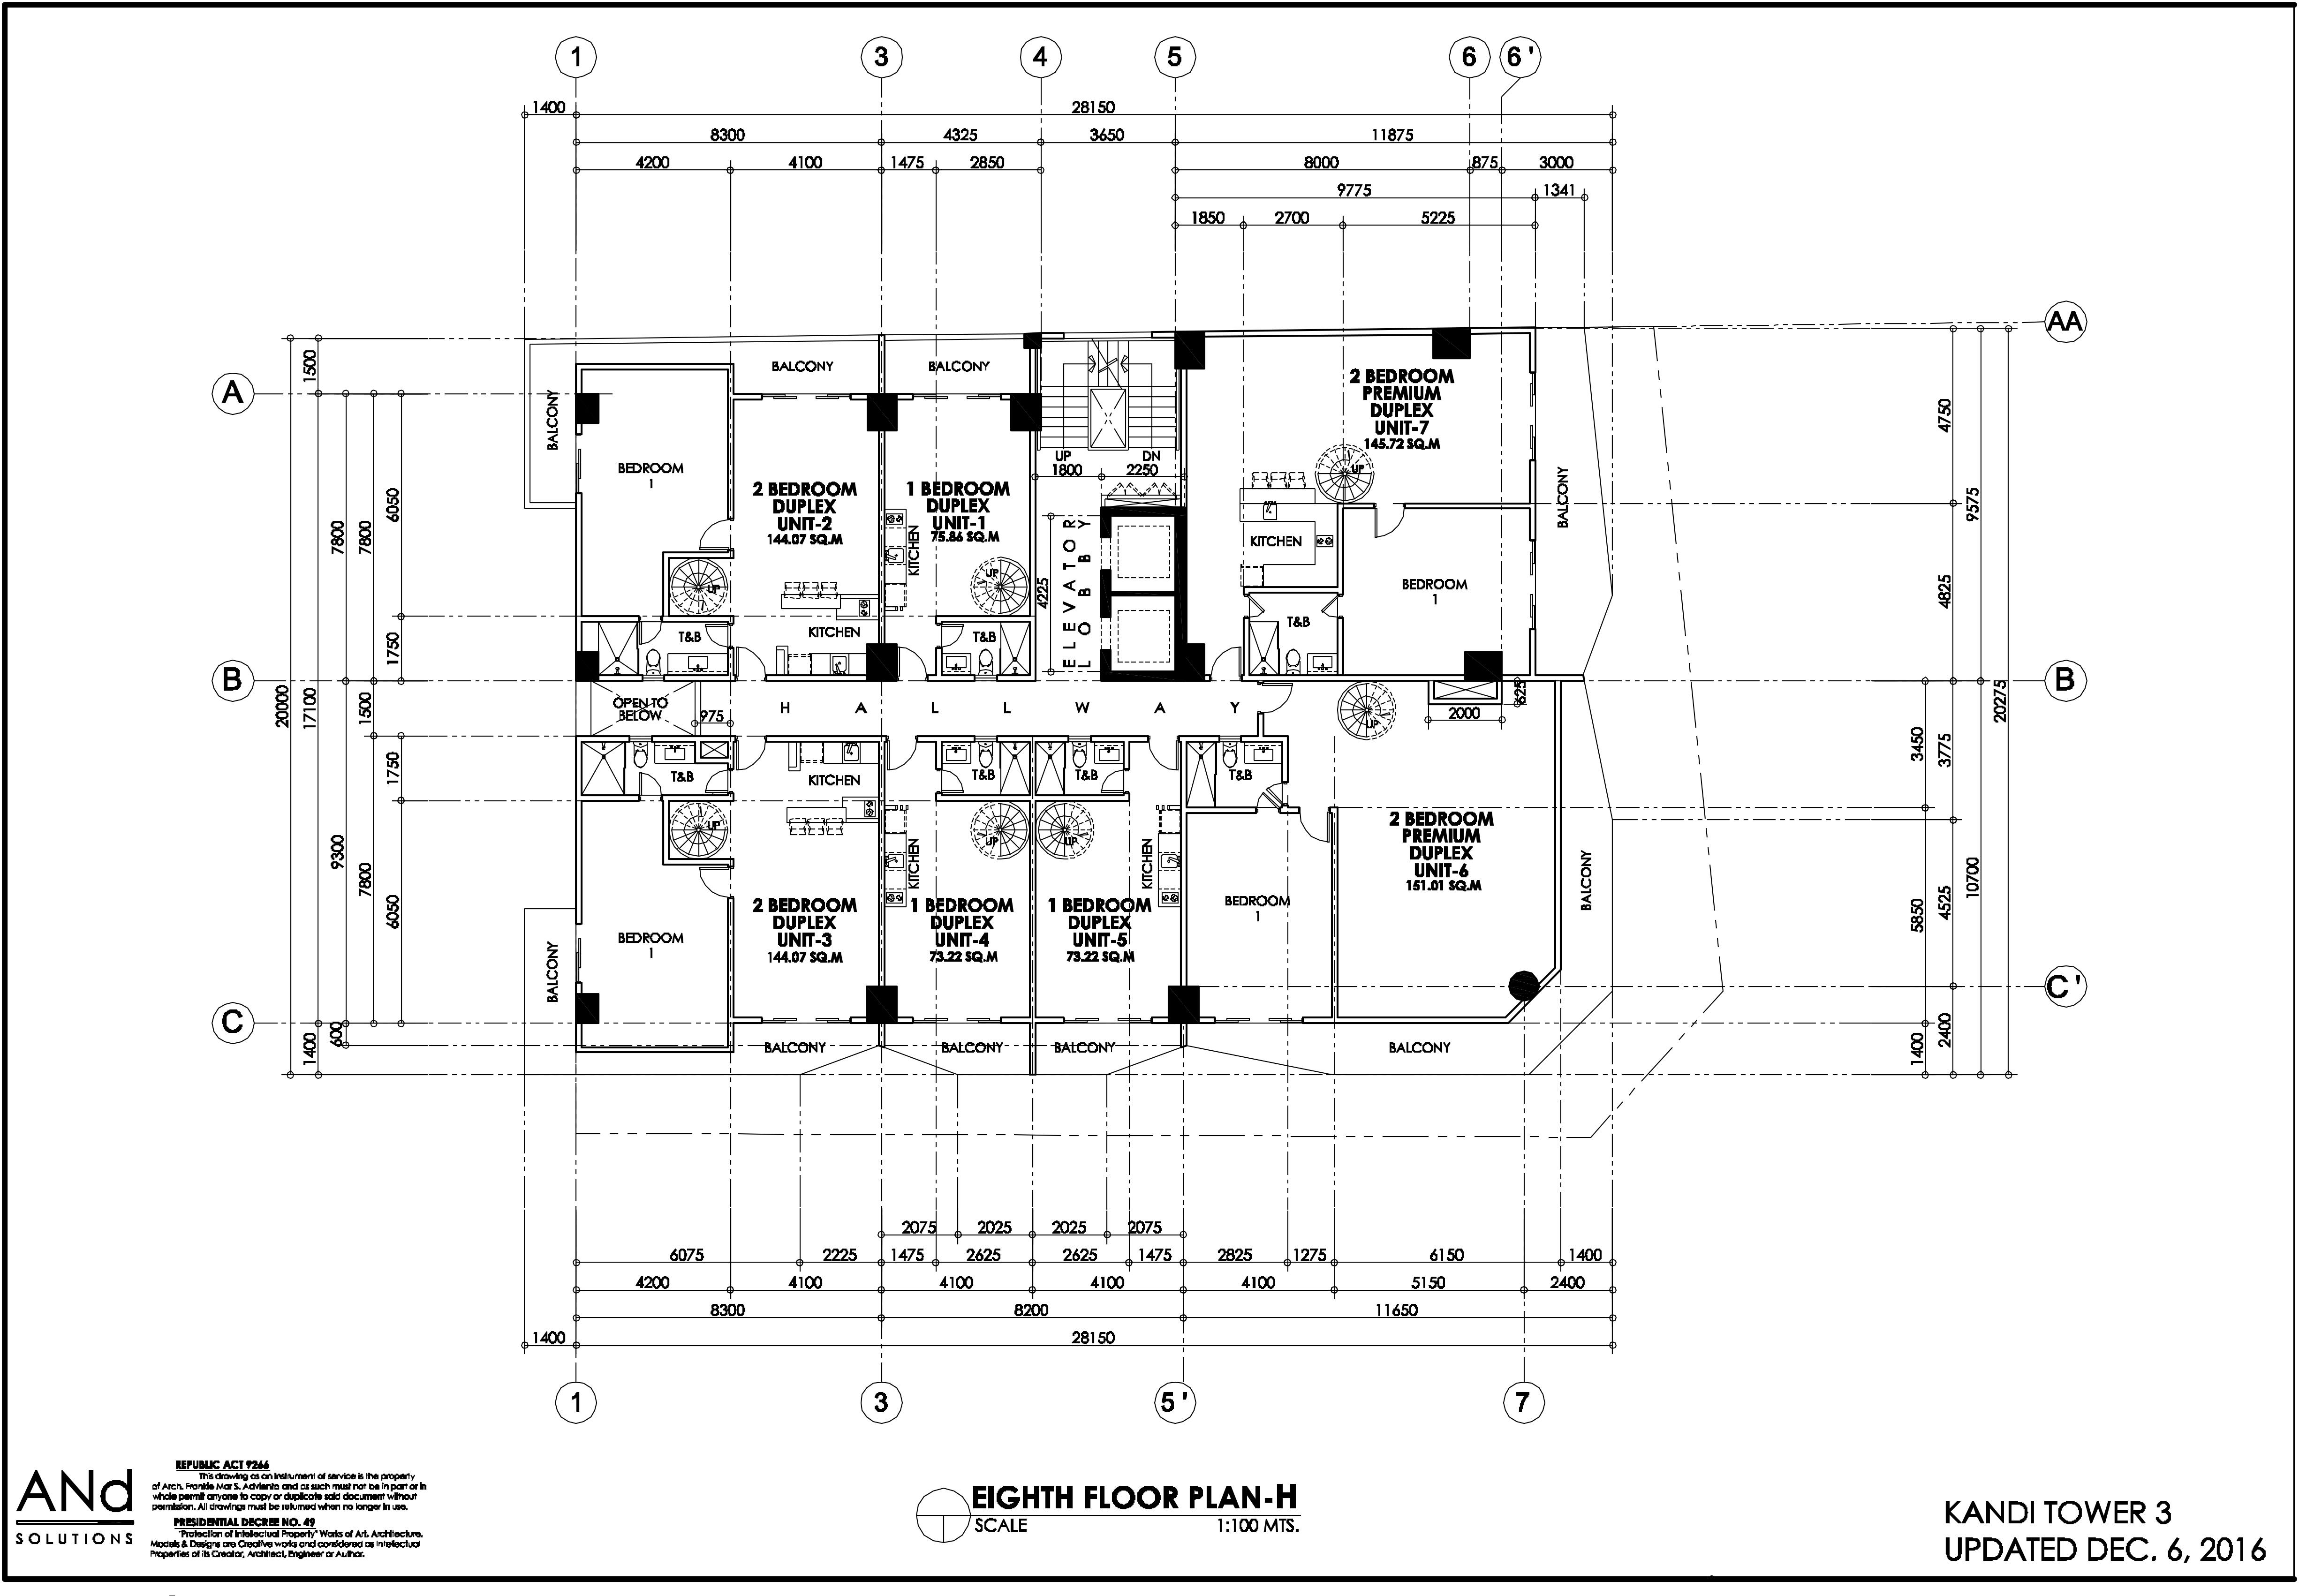 buy now kandi realty kandi towers 3 8th floor level h